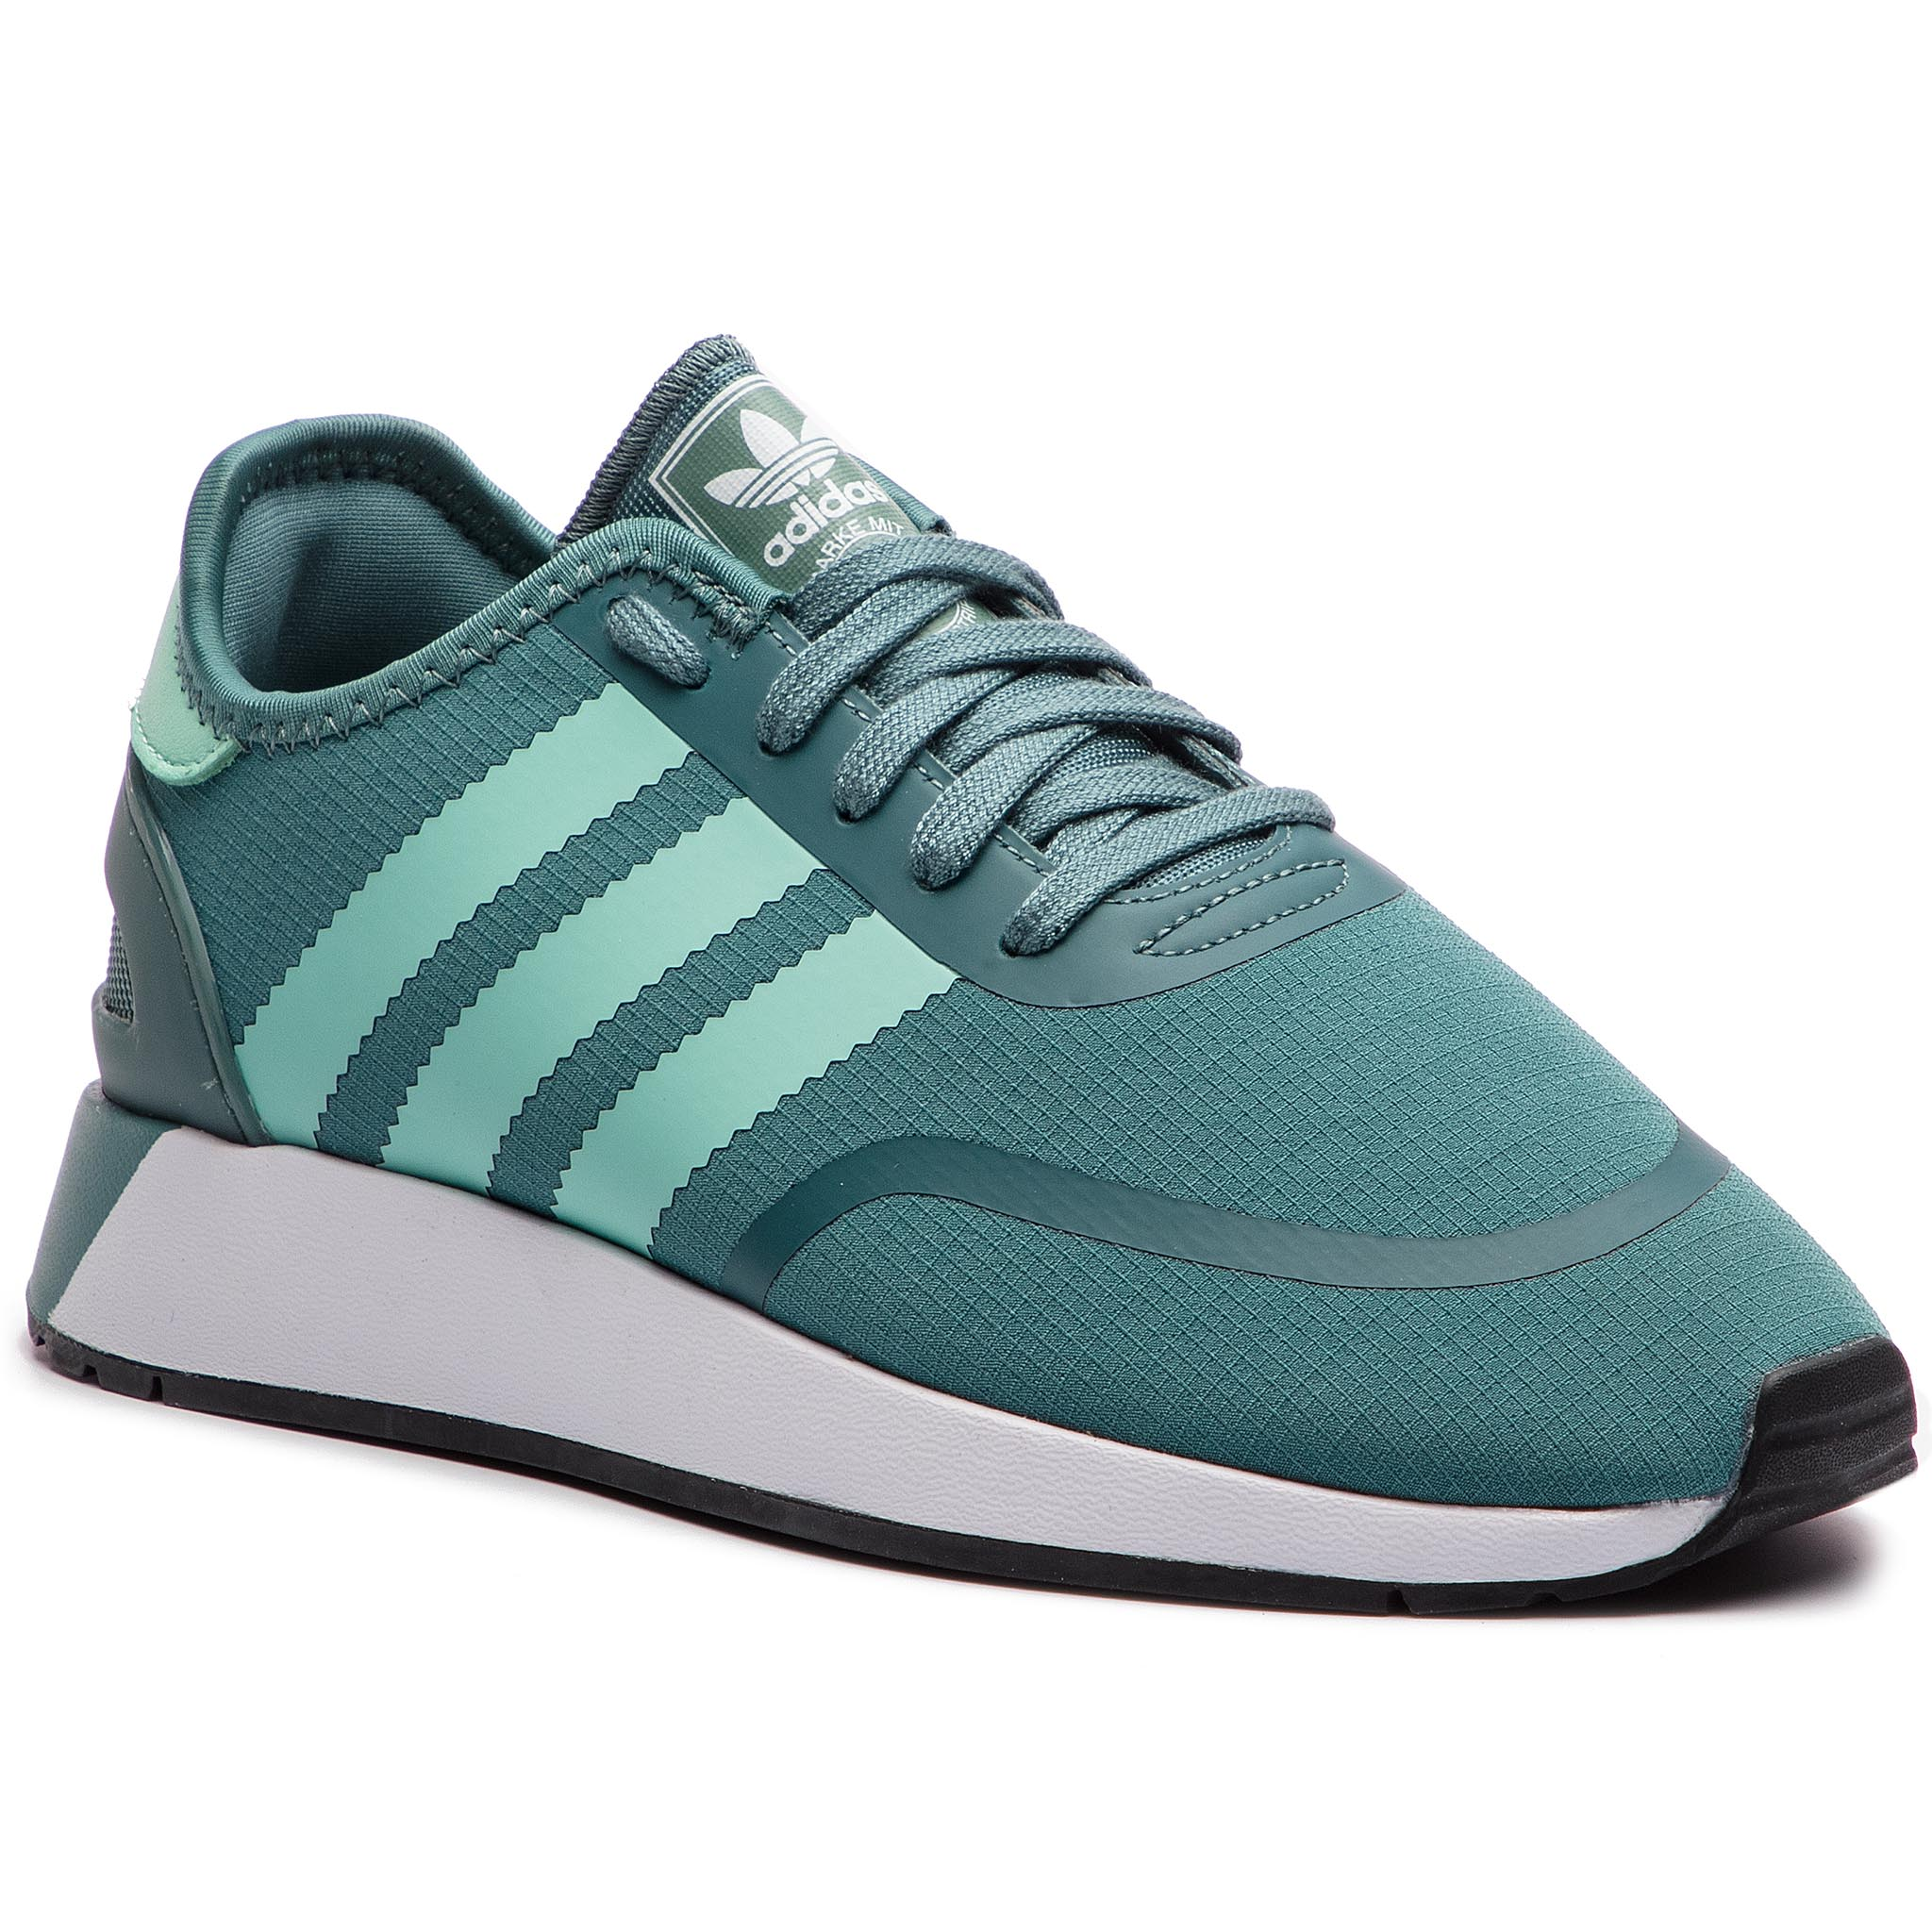 dbdc5d678c6 Shoes adidas - Swift Run B37727 Conavy Conavy Ftwwht - Sneakers ...